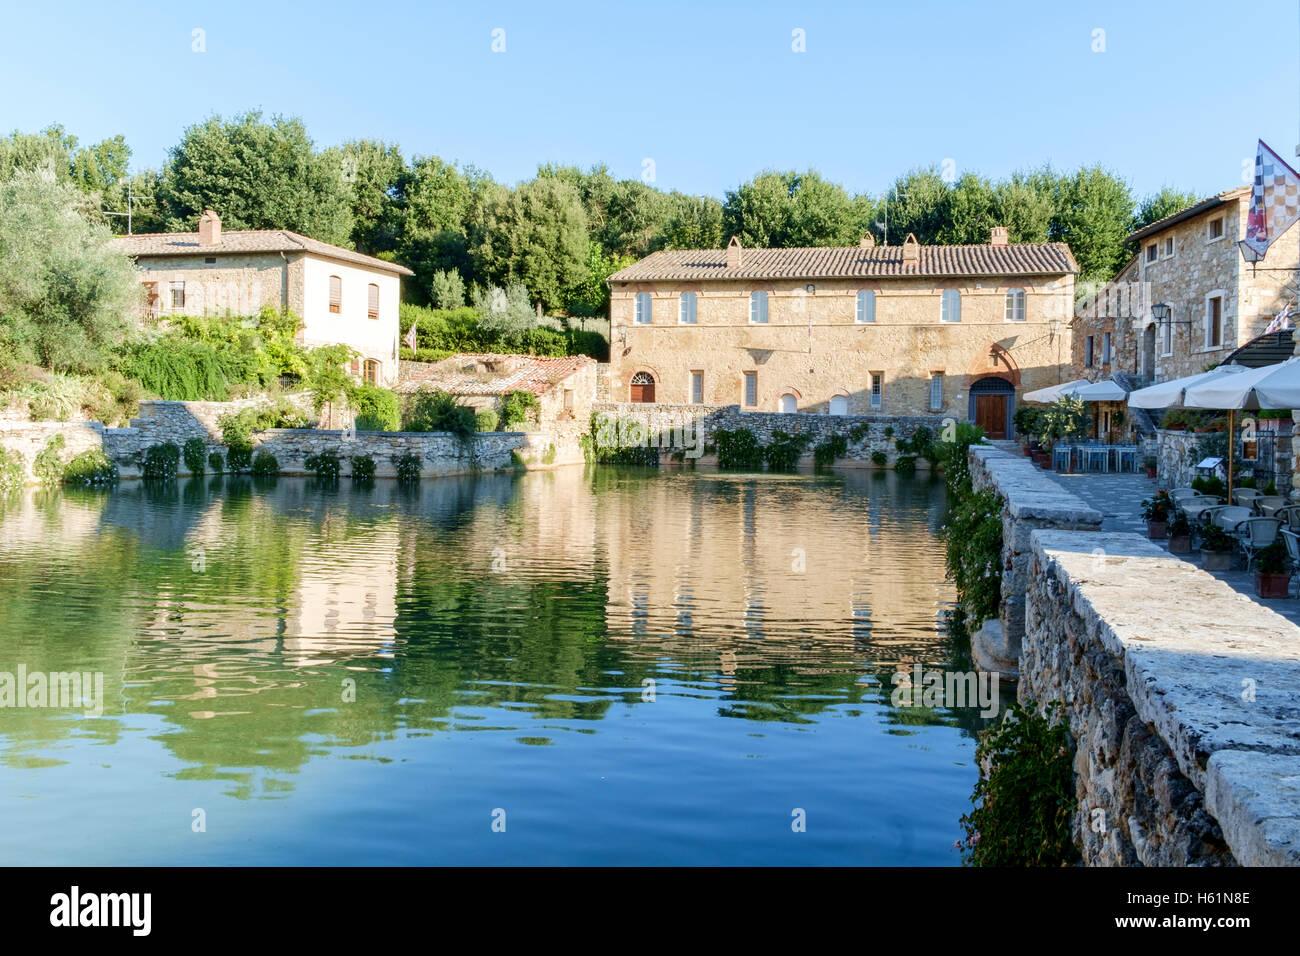 Hot springs, Bagno Vignoni, Val d\'Orcia, Tuscany, Italy Stock Photo ...